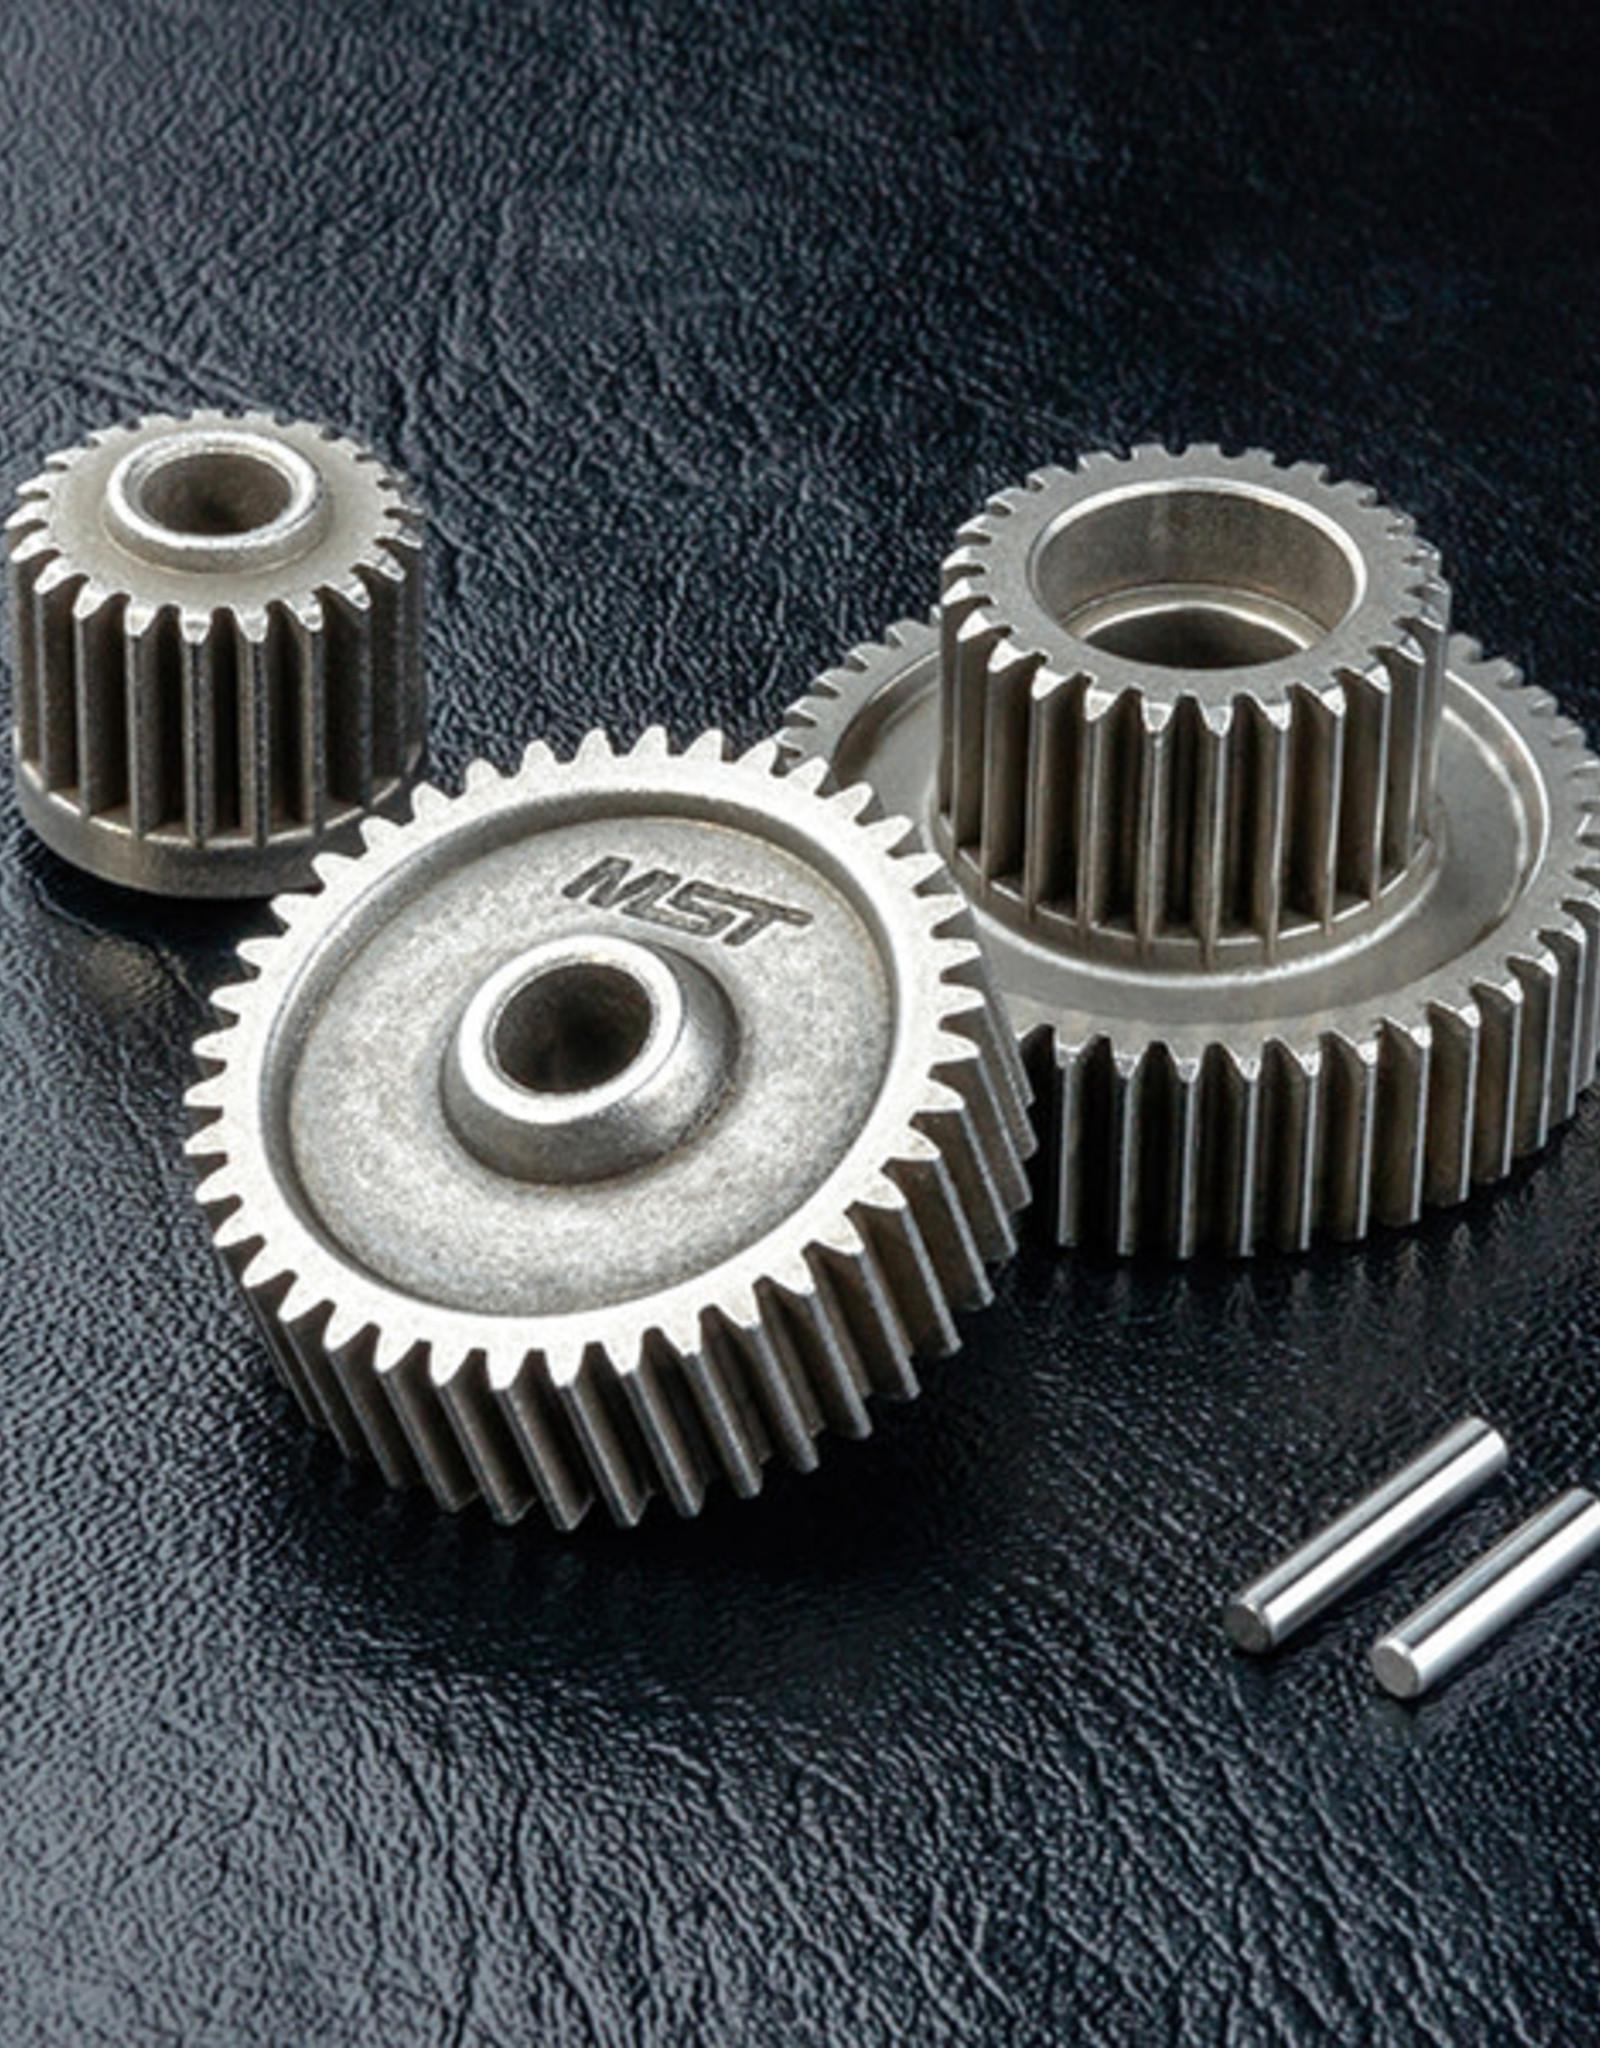 MST MXPSD210564 CMX Metal center gear set by MST